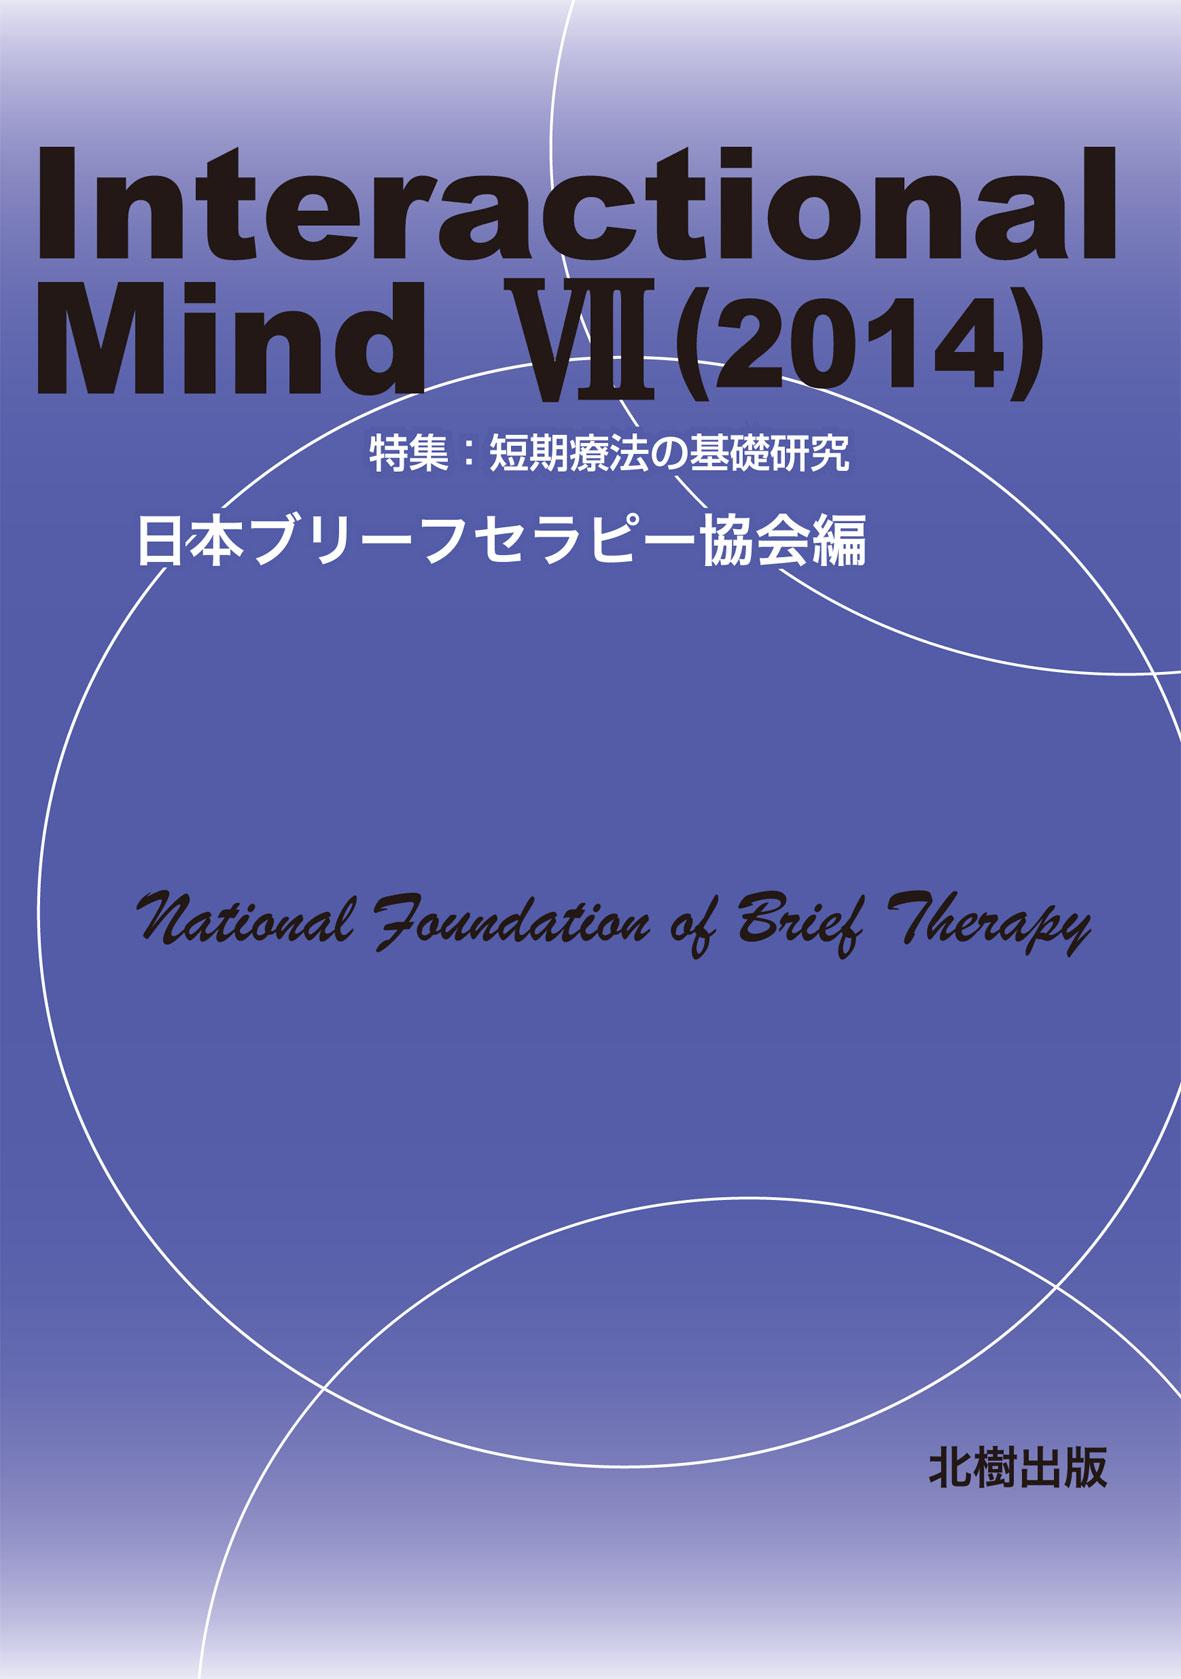 Interactional Mind VII(2014)